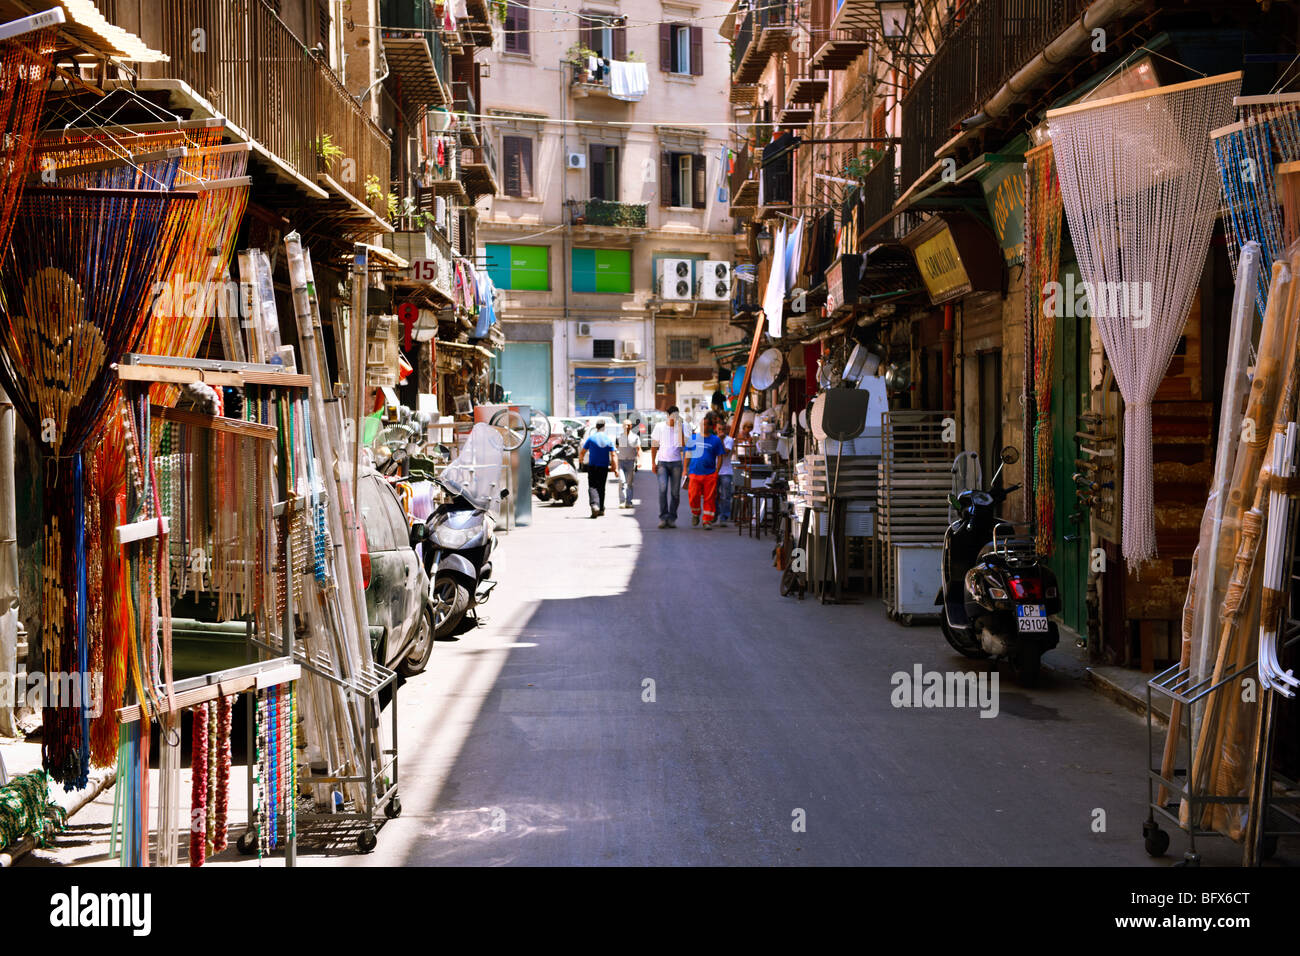 Via Calderai, street shops, Sicily - Stock Image